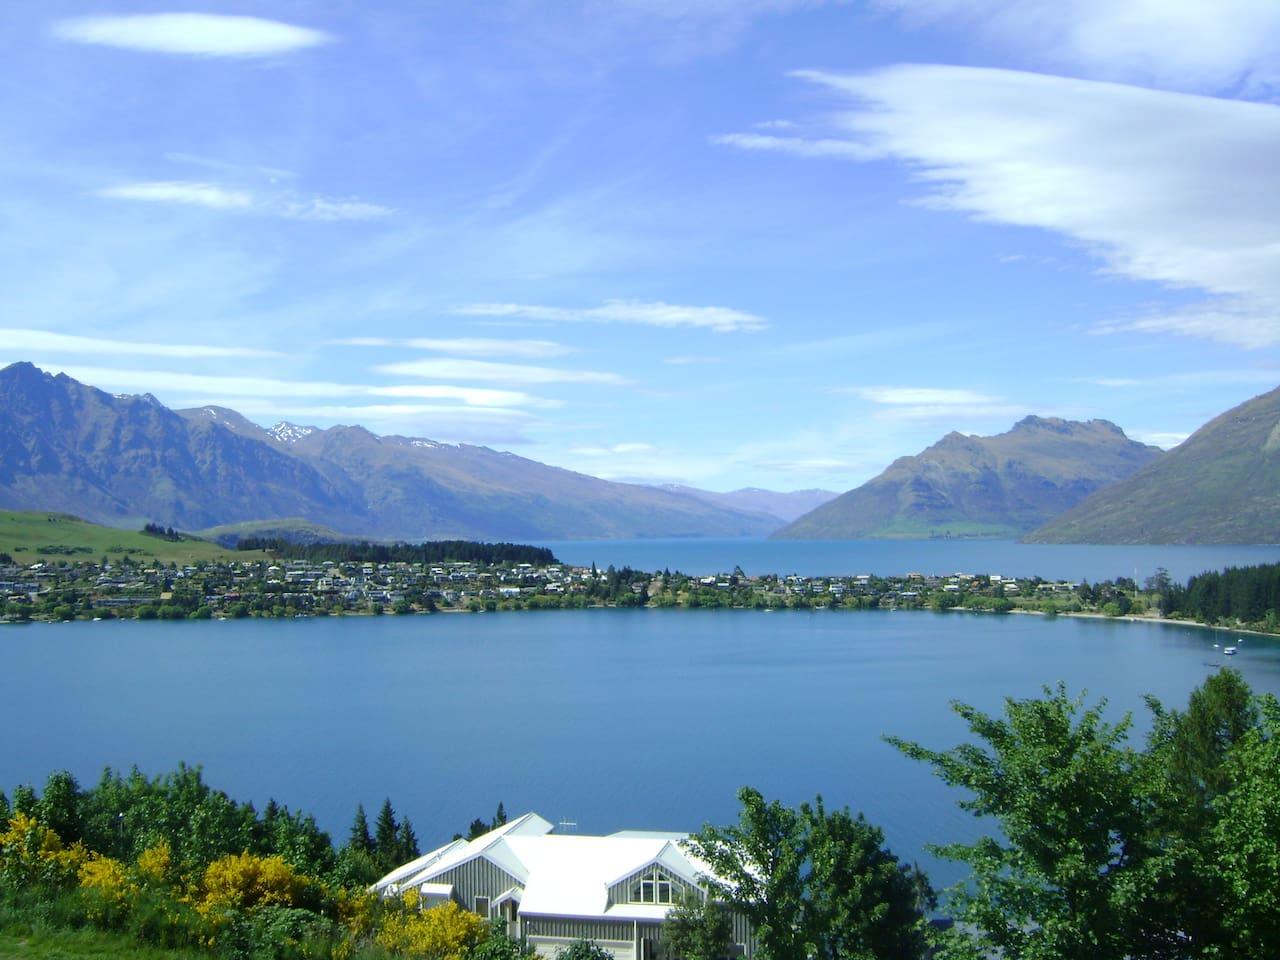 Sensational Lake and Mountain Views